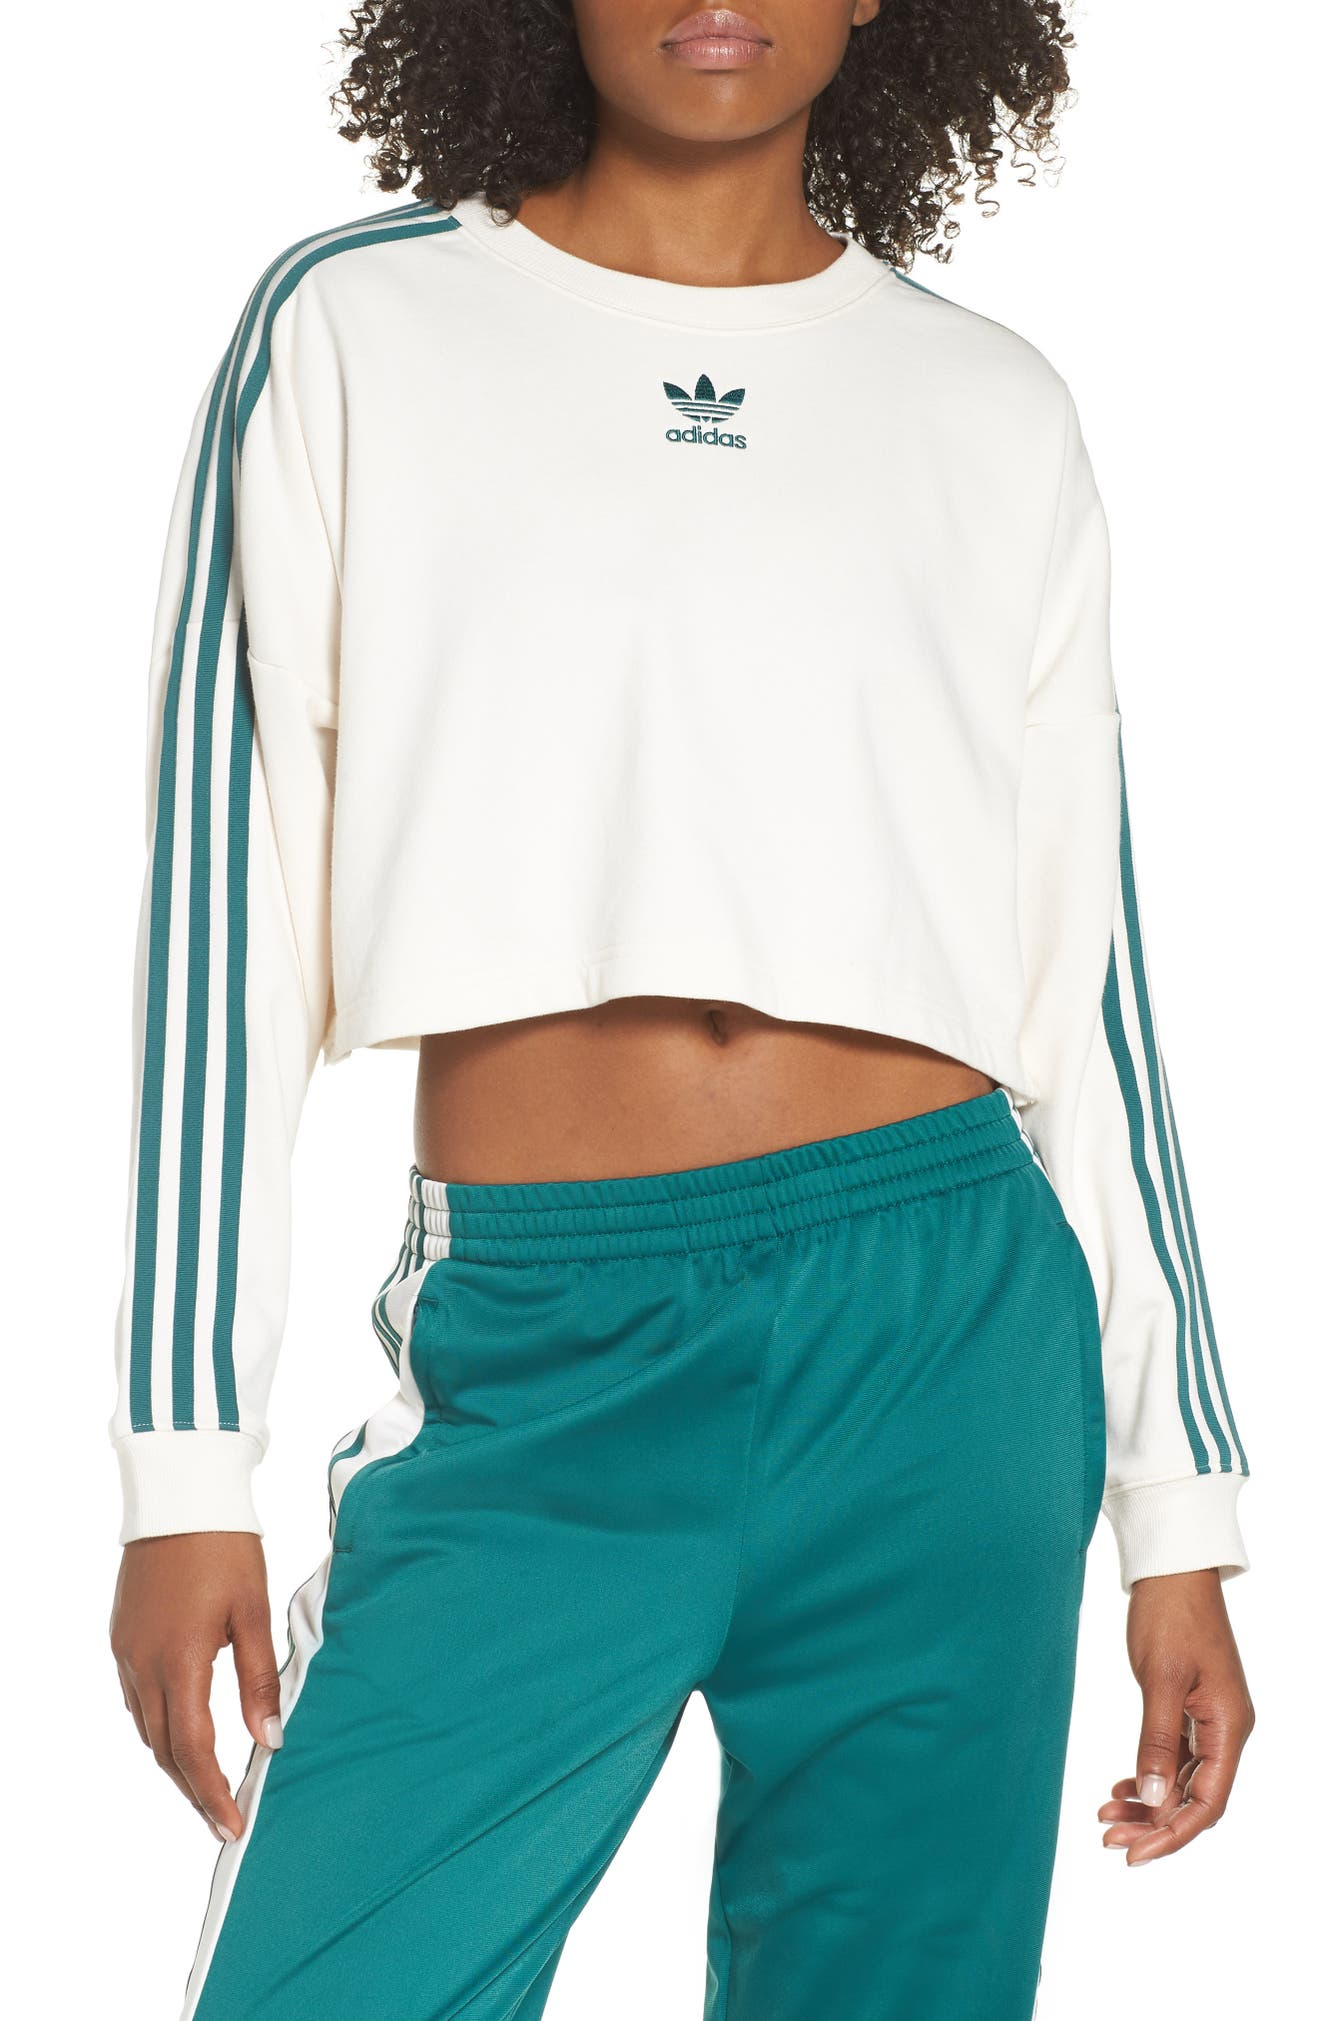 df68da95bbf7 adidas originals adibreak cropped sweatshirt